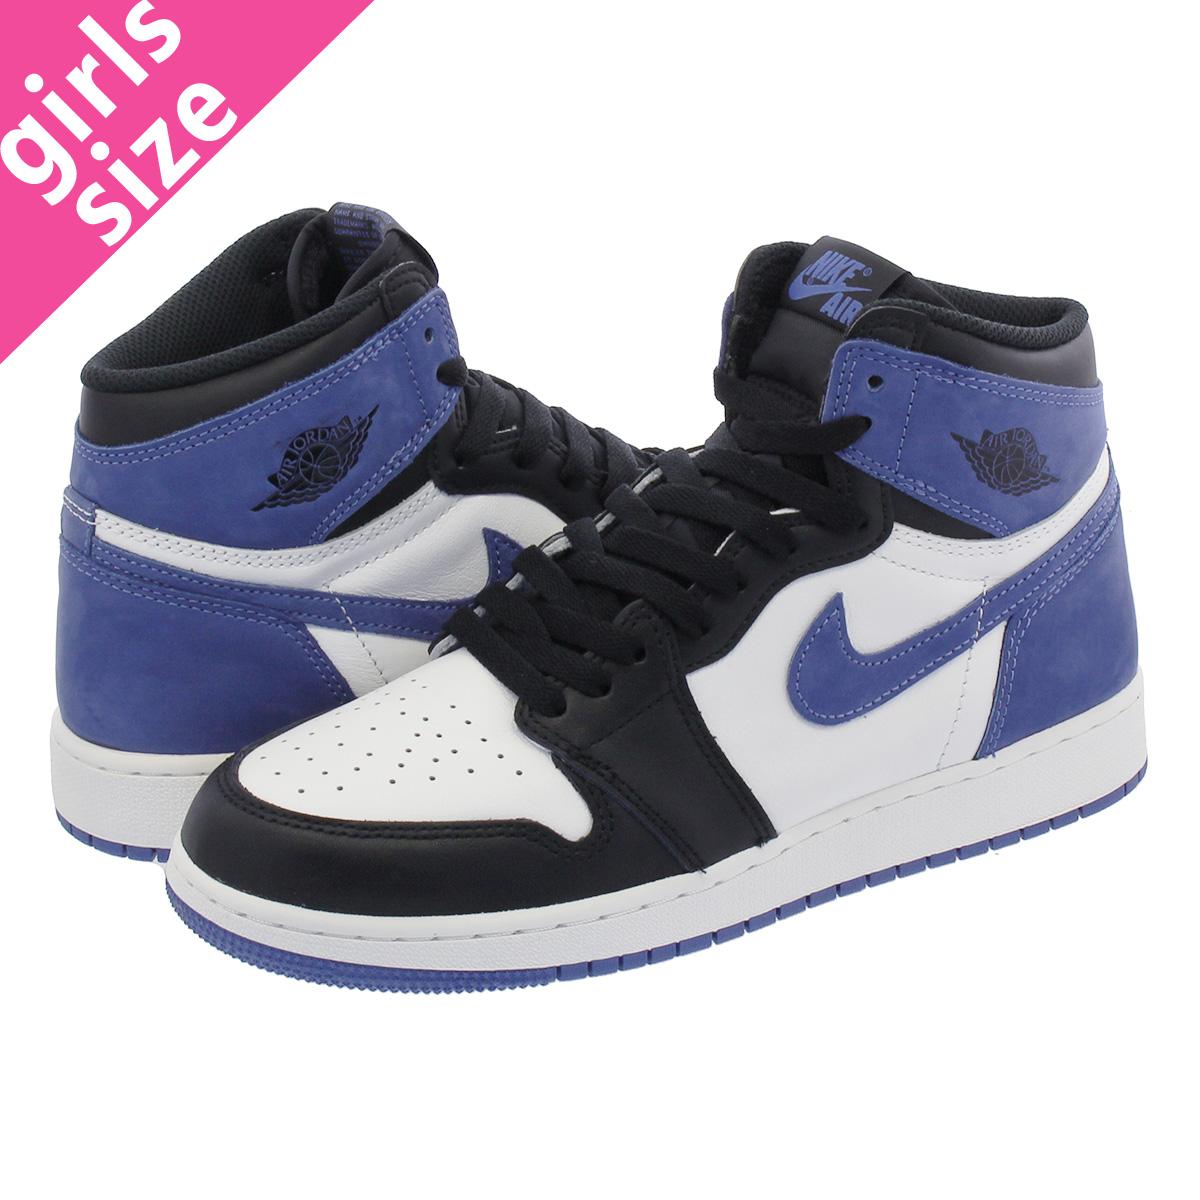 NIKE AIR JORDAN 1 RETRO HIGH OG BG Nike Air Jordan 1 nostalgic high OG BG  SUMMIT WHITE/BLUE MOON/BLACK 575,441-115